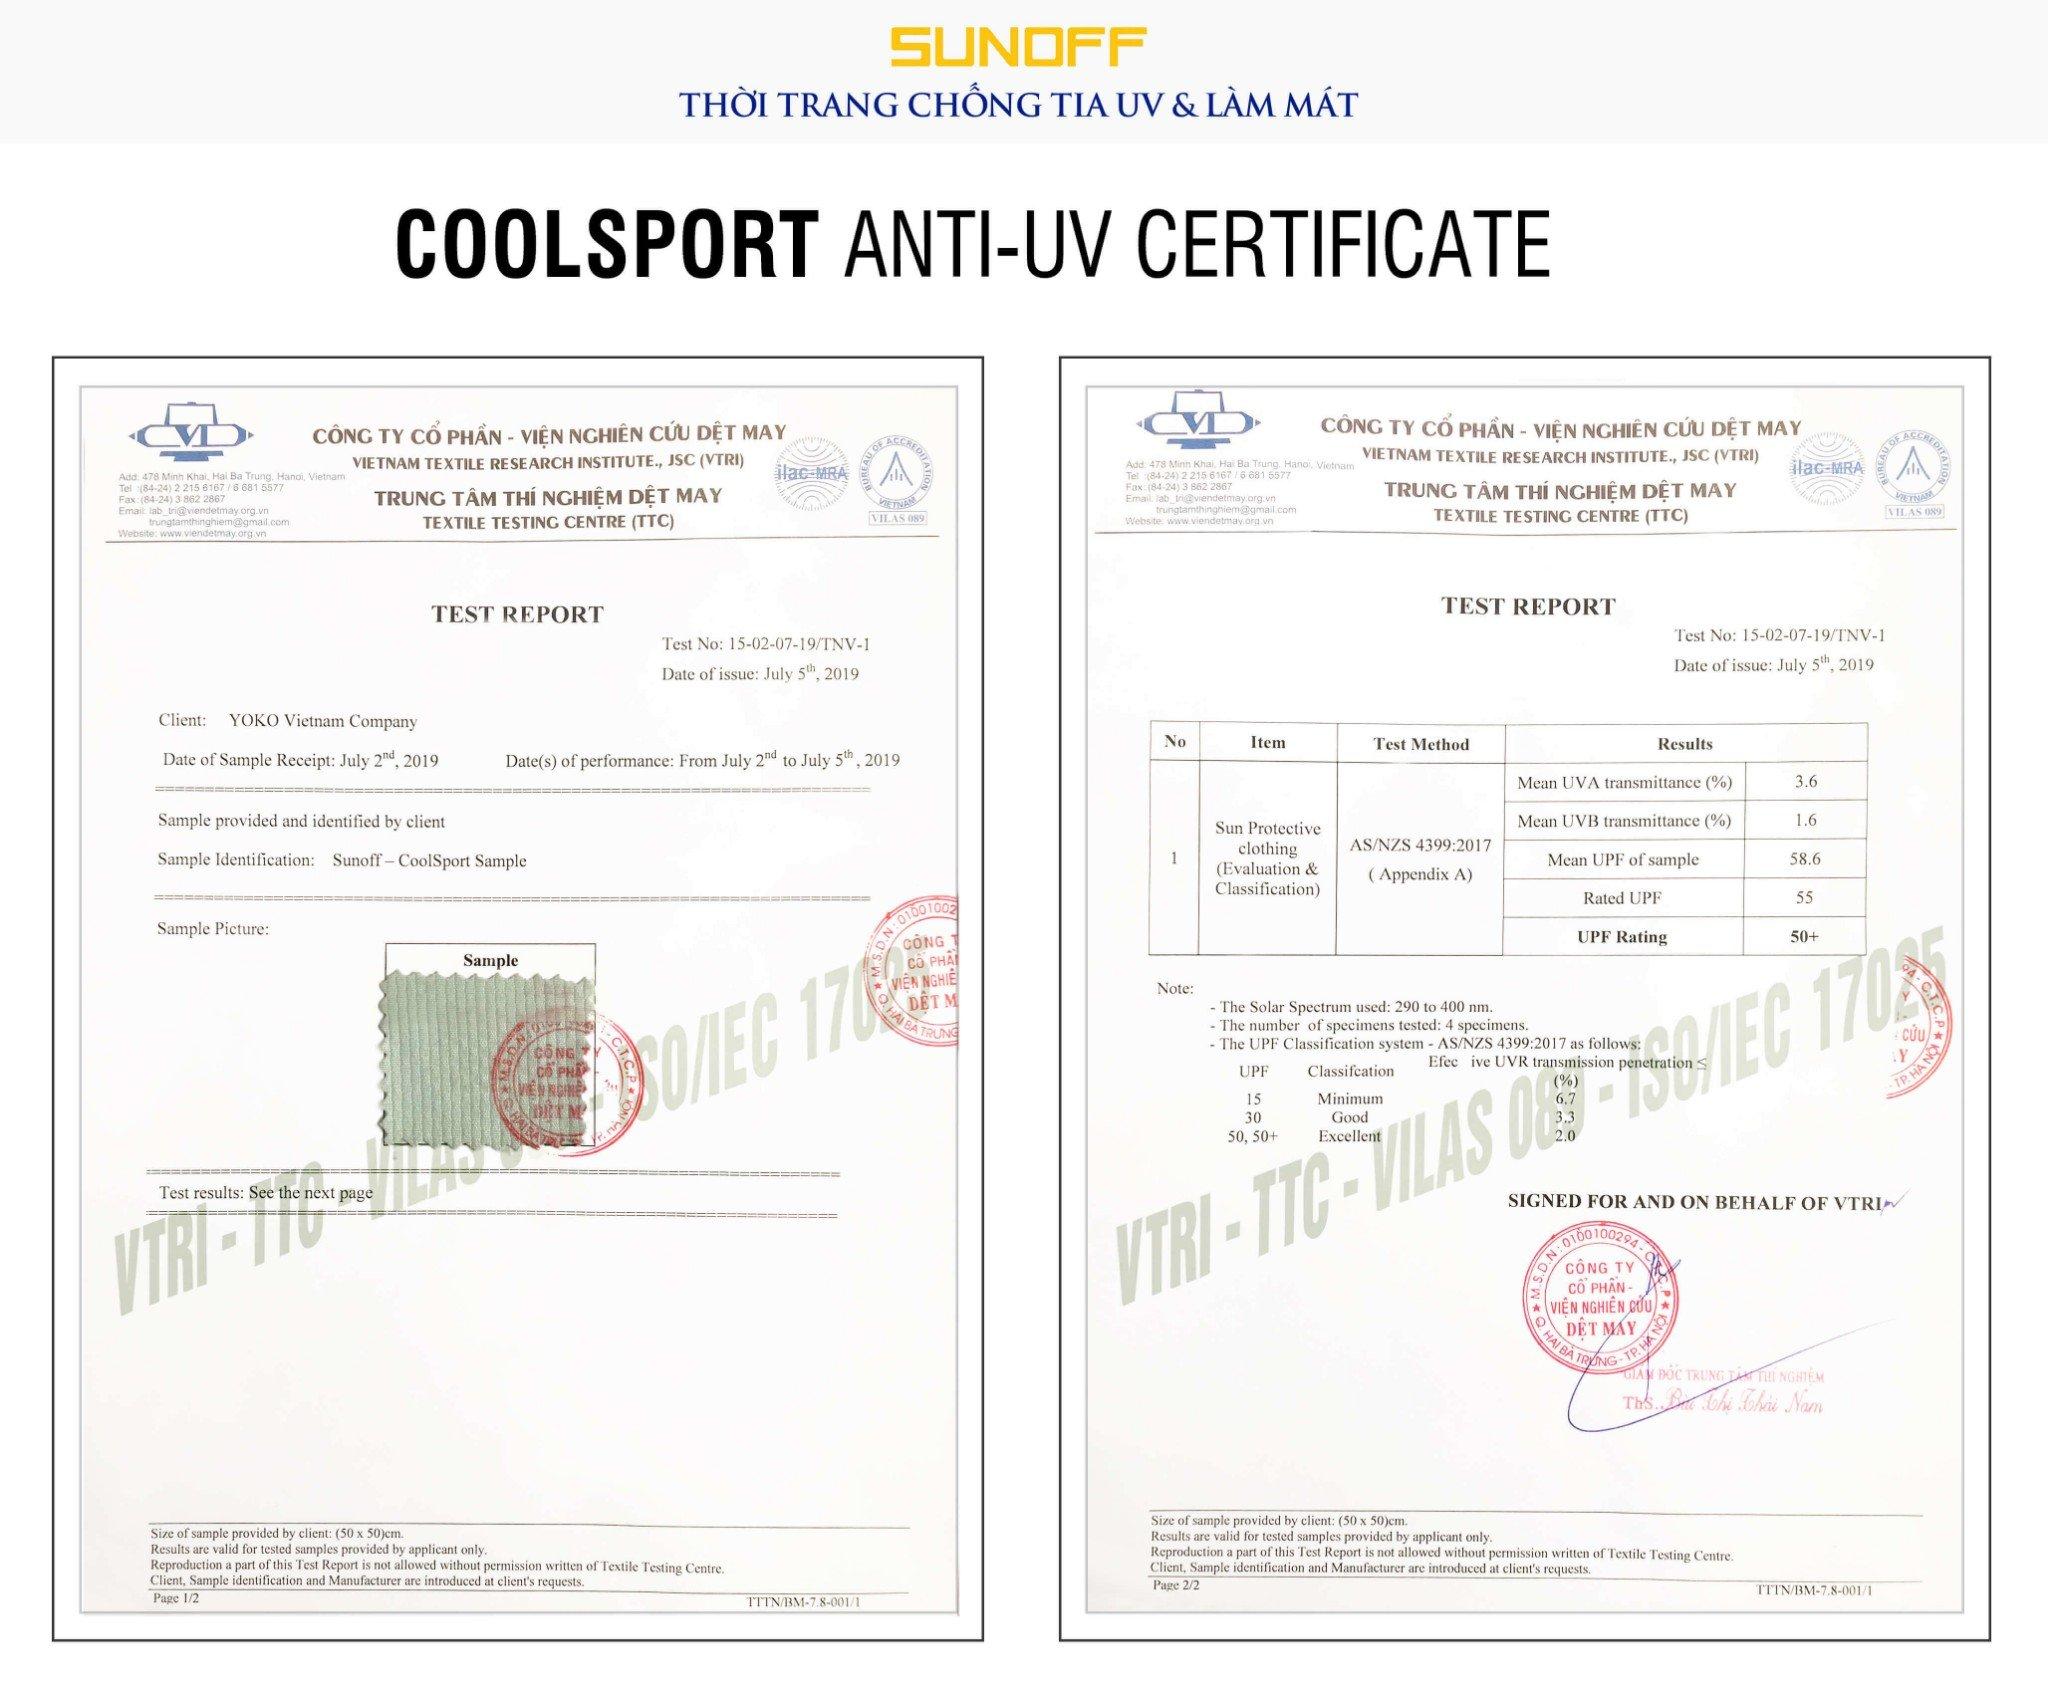 Giay-chung-nhan-chong-tia-uv-coolsport-sunoff.jpg